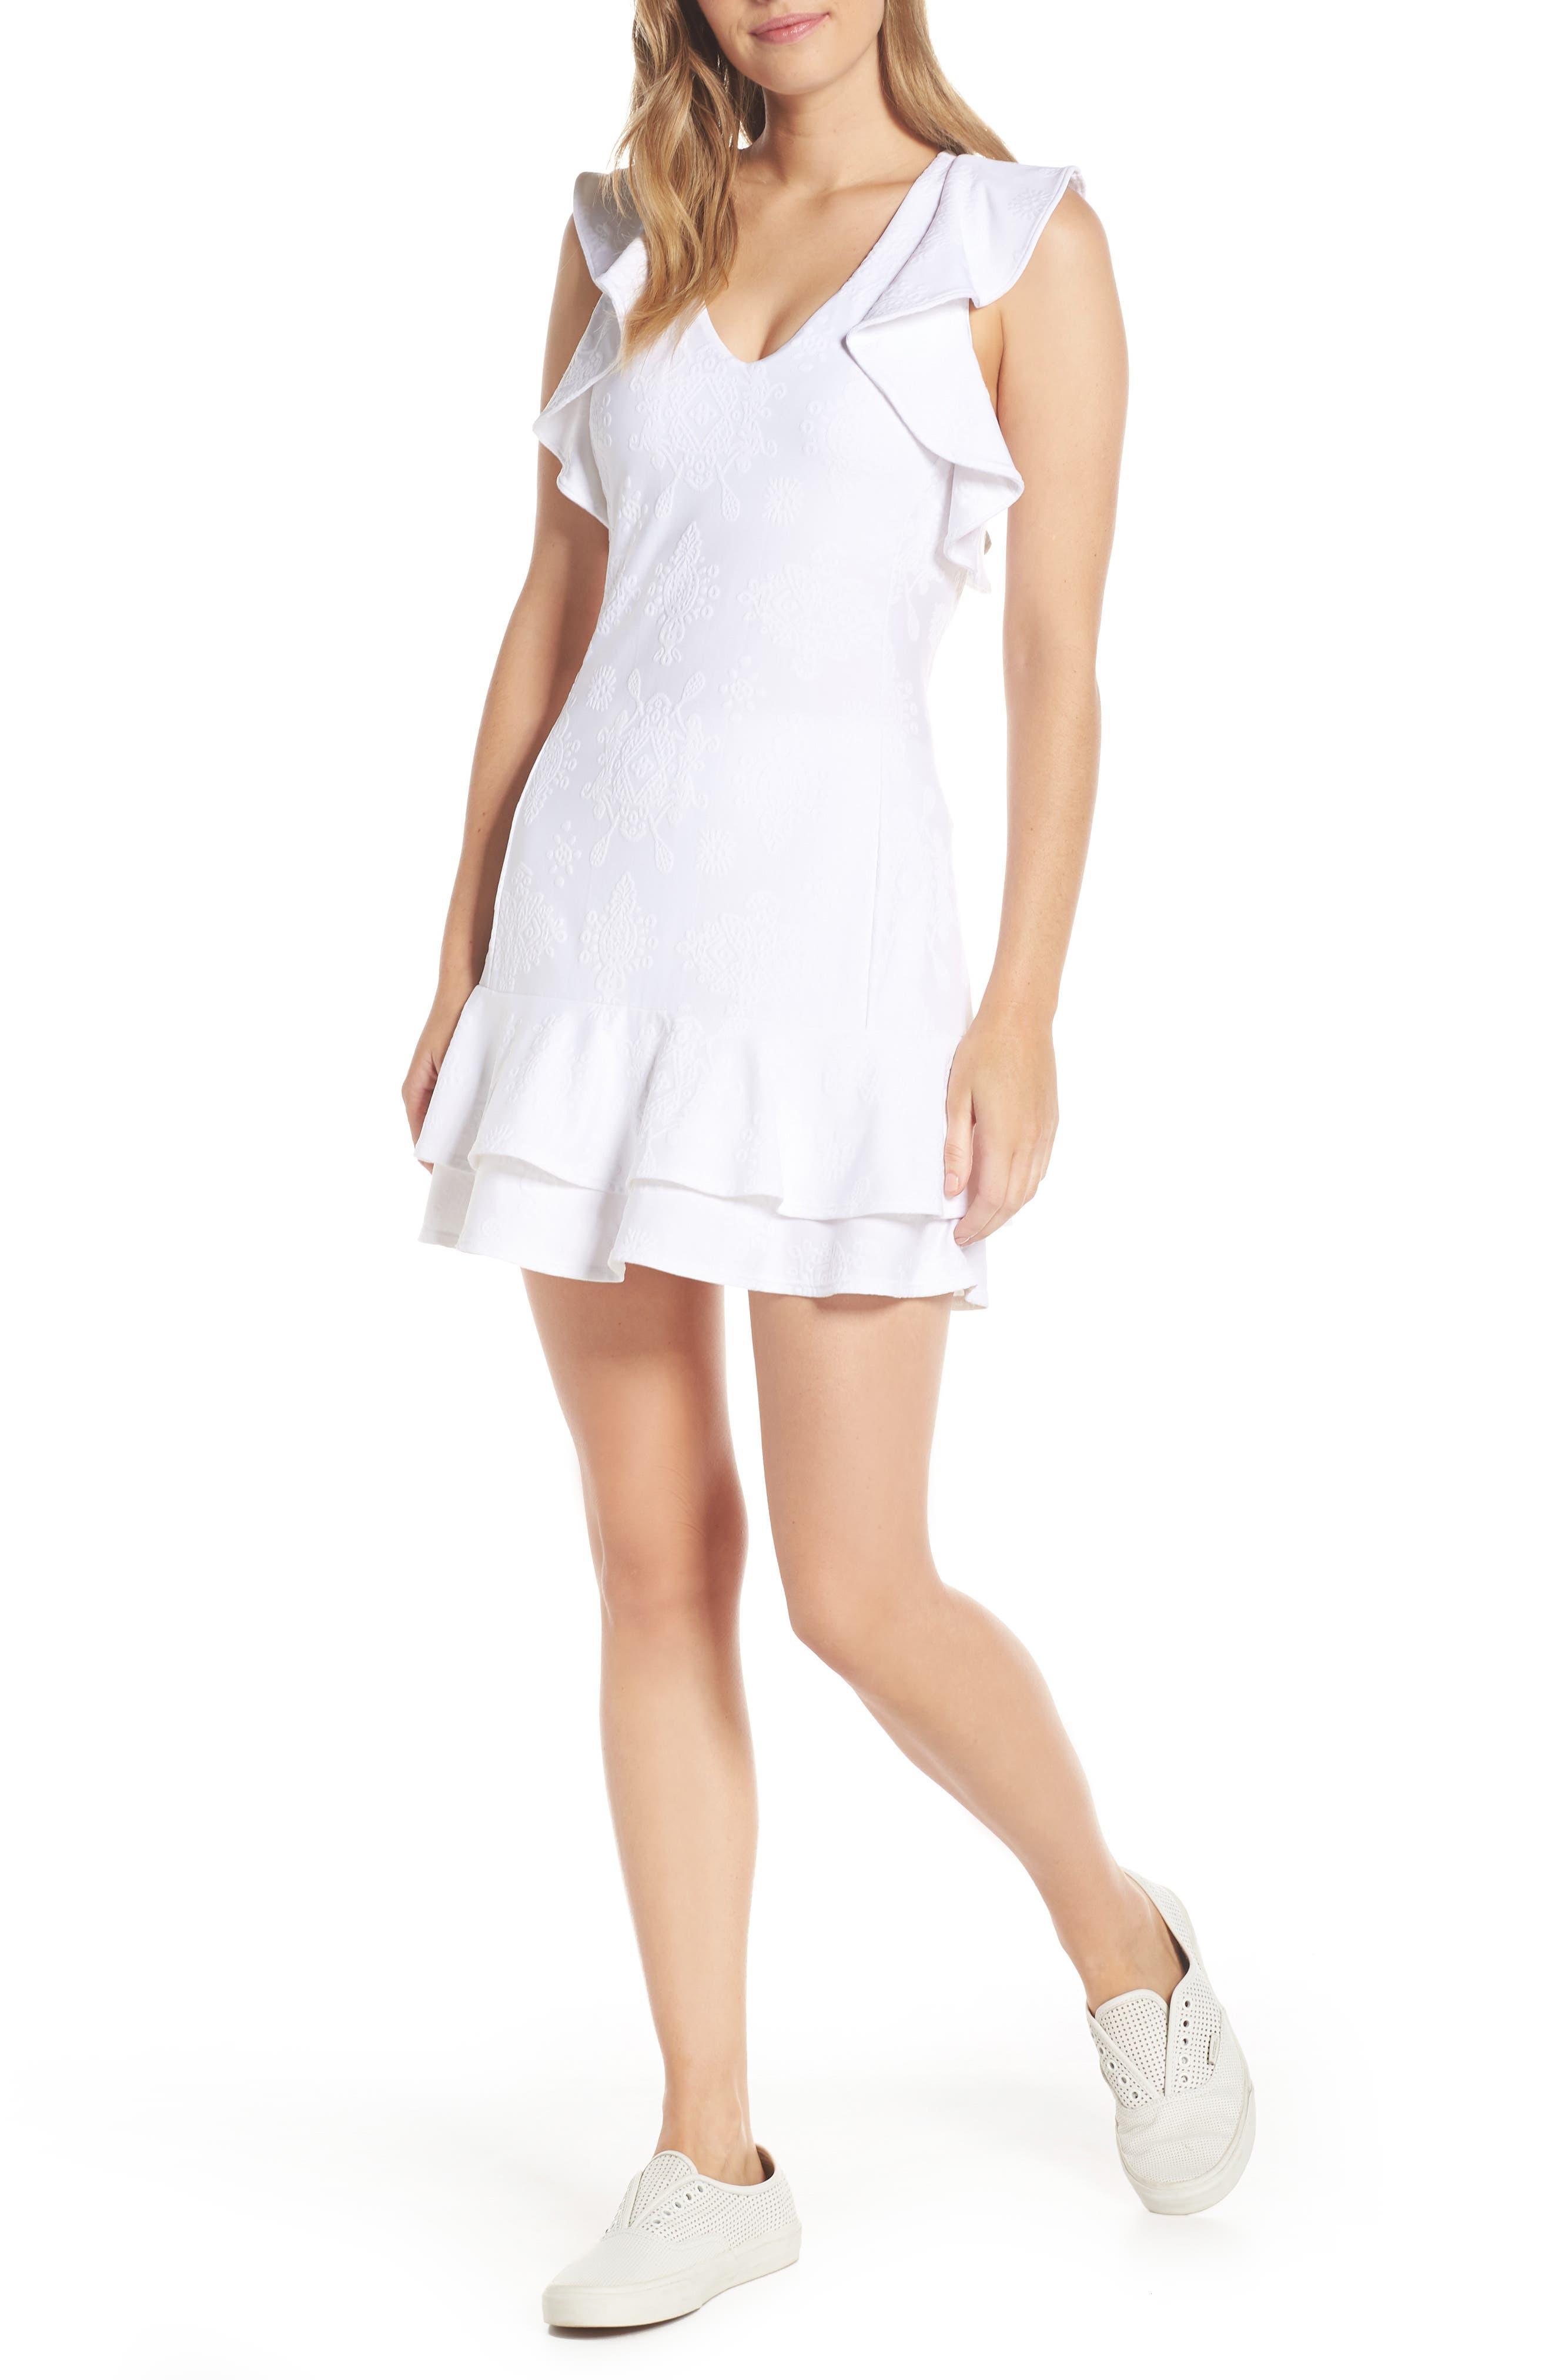 Lilly Pulitzer Luxletic - Rally Upf 50+ Ruffle Tennis Dress, White